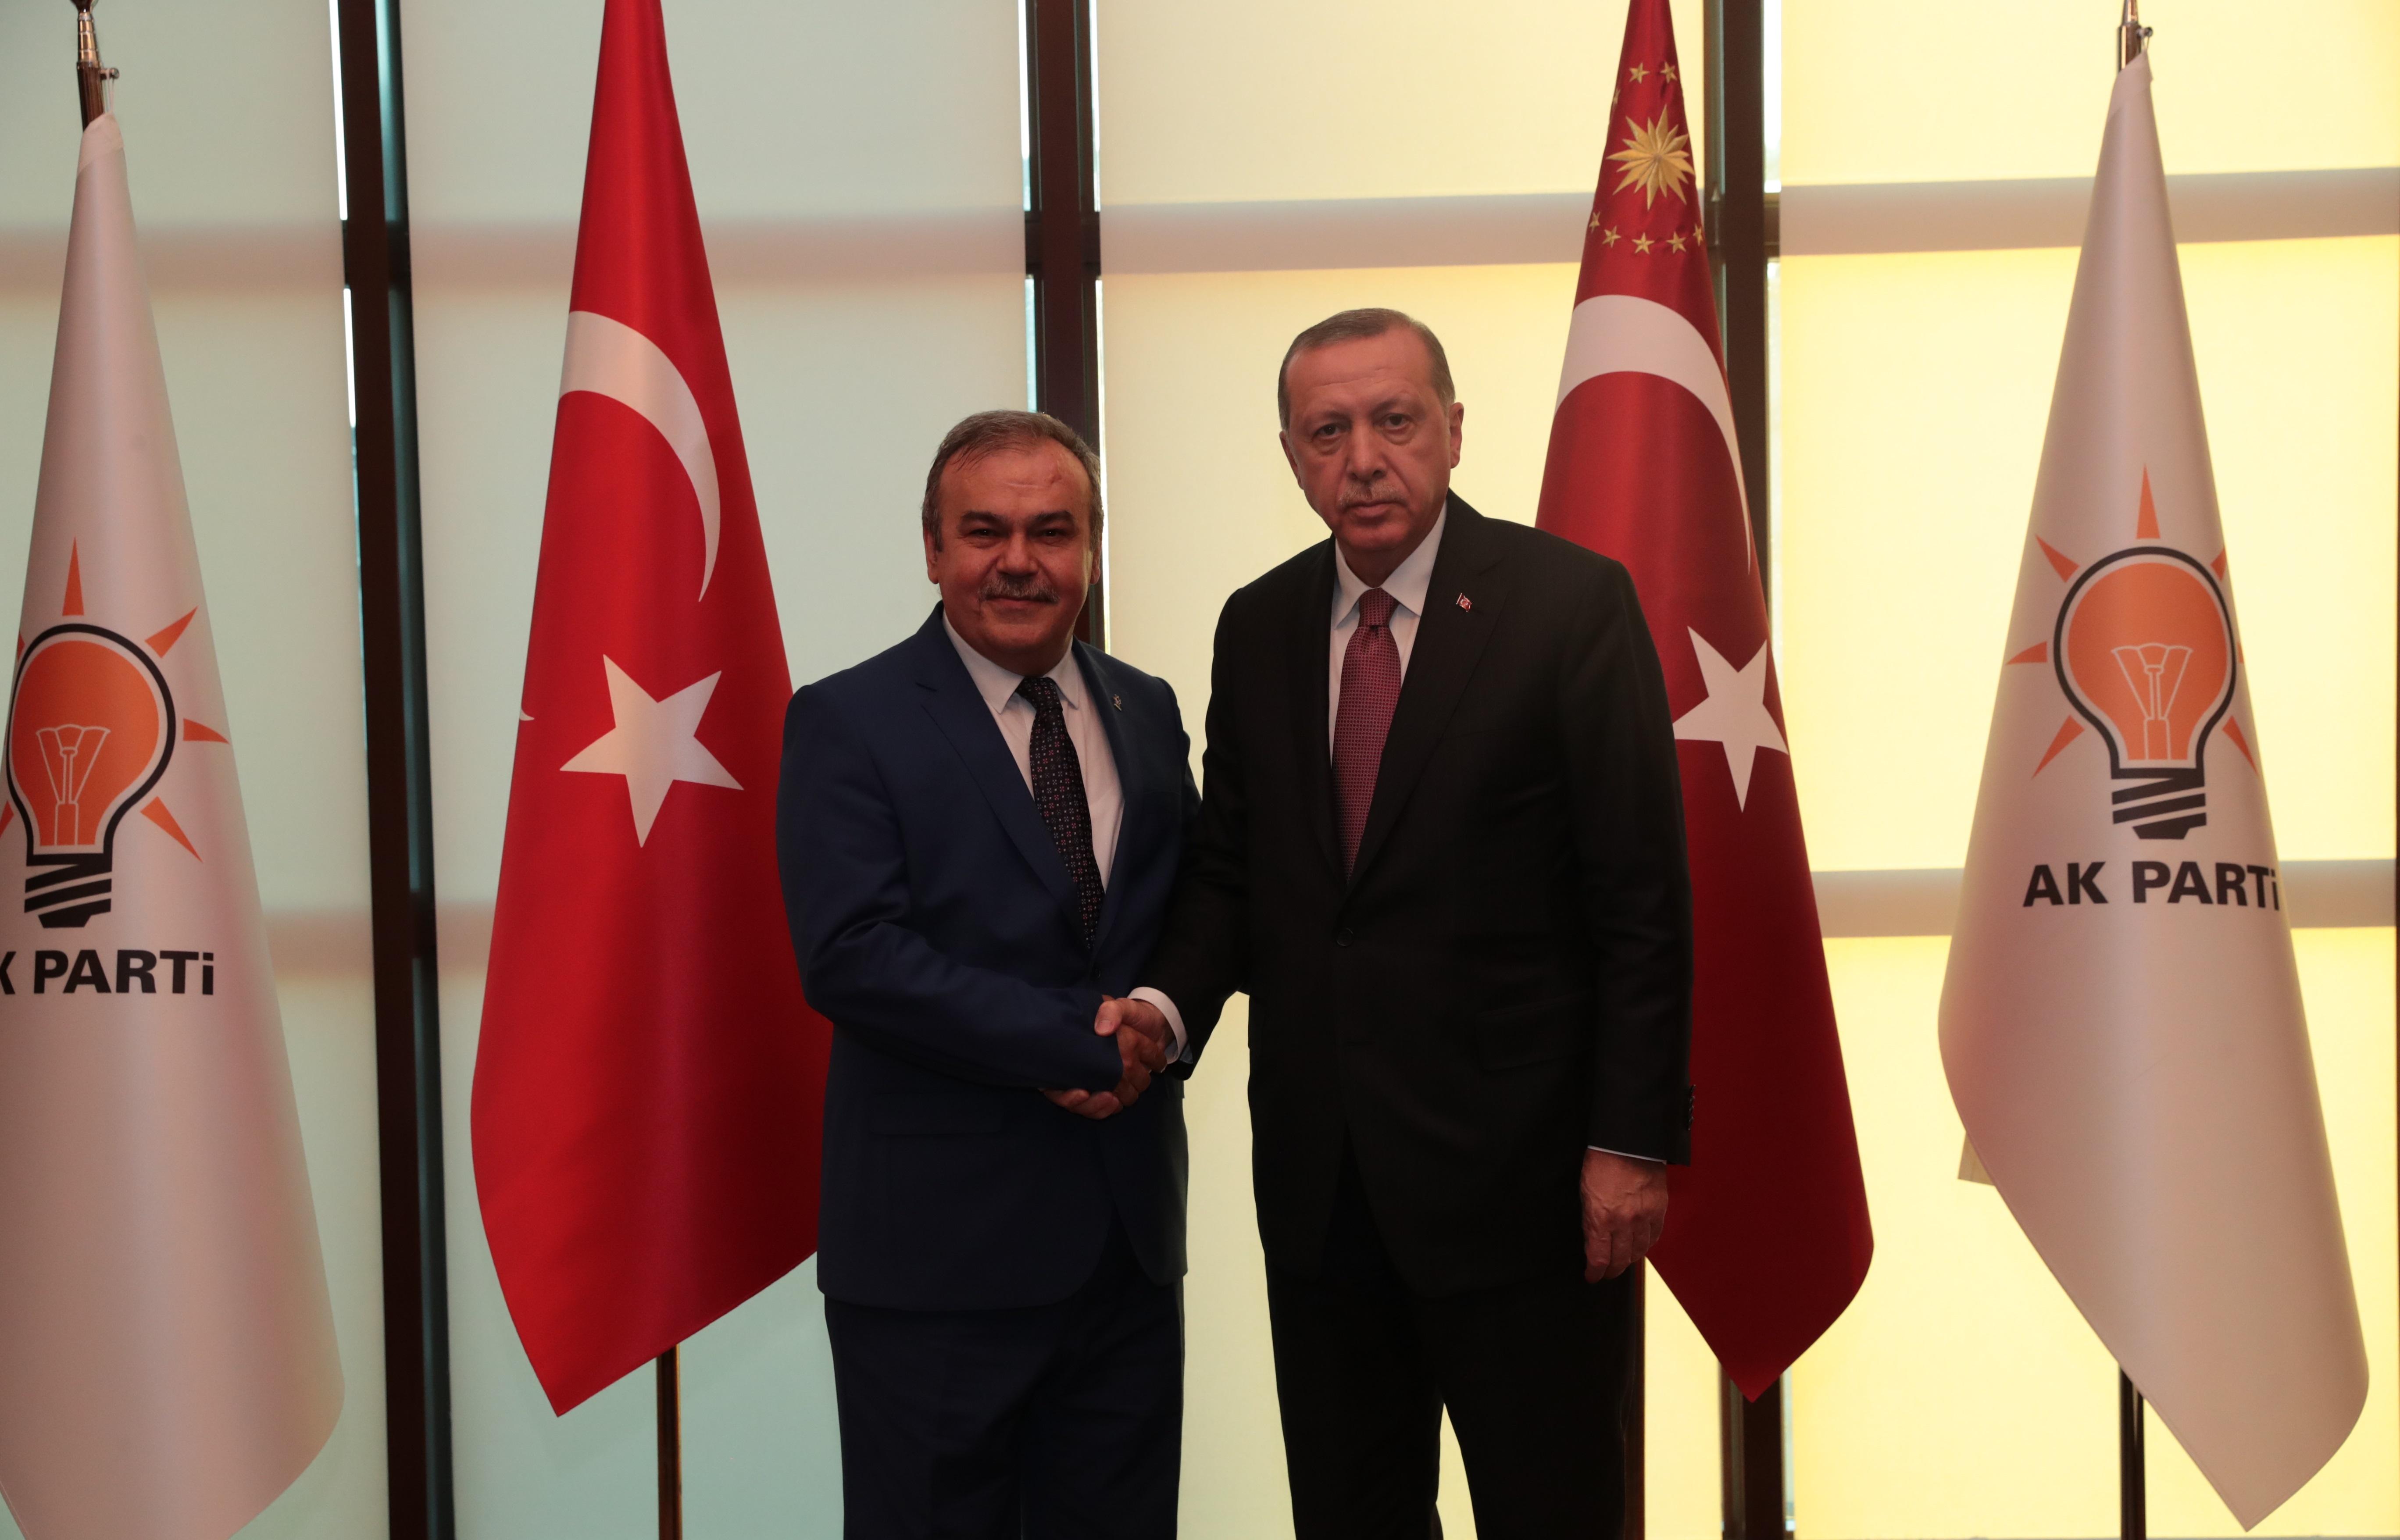 AKP İL BAŞKANI HALİT TOMAKİN'LE DEVAM KARARI ALINDI